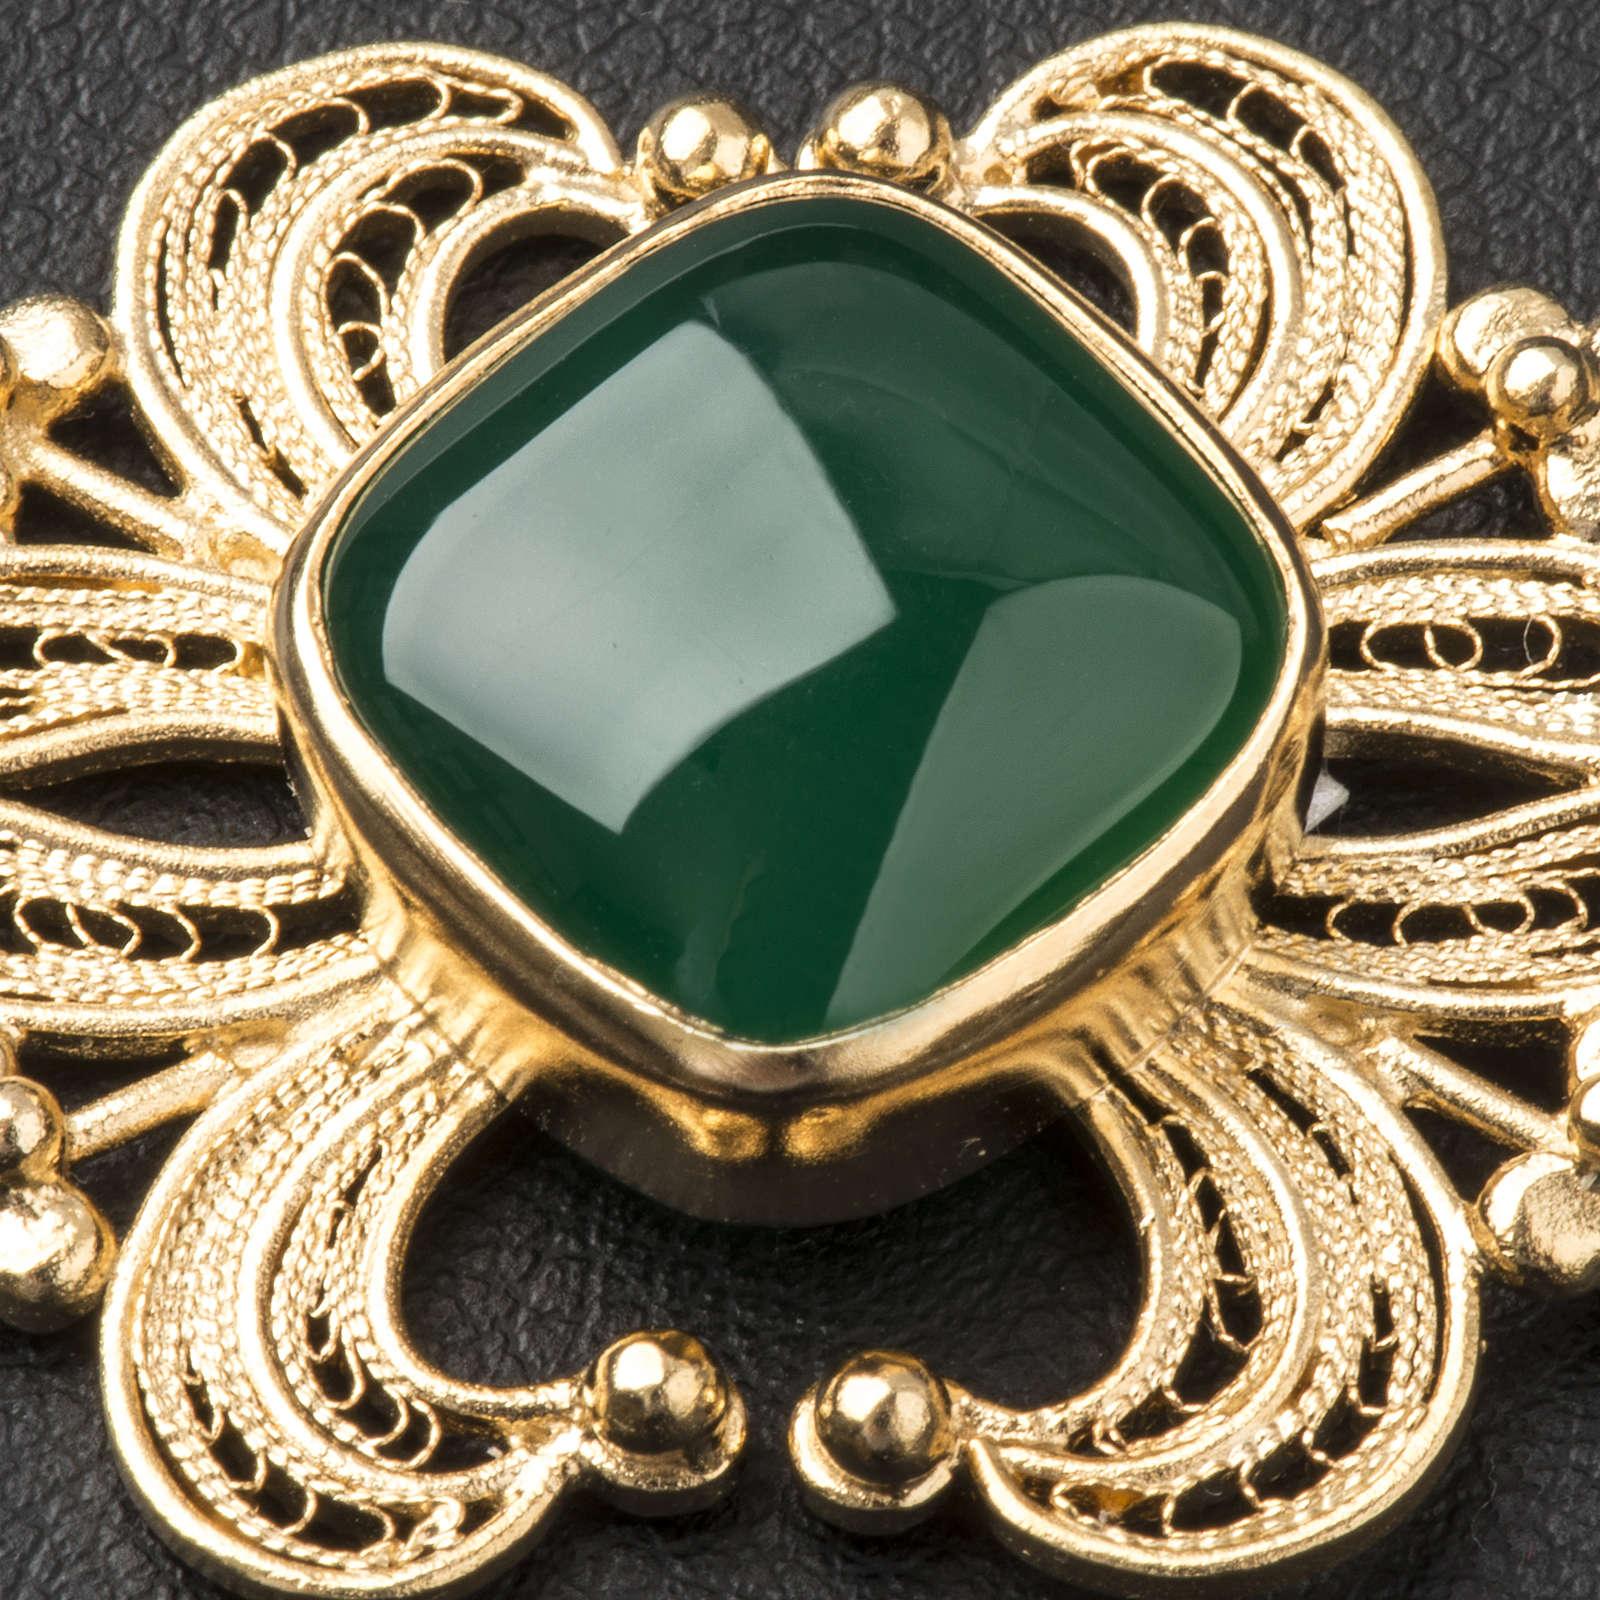 Broche dorado pluvial piedra ágata verde plata 800 4